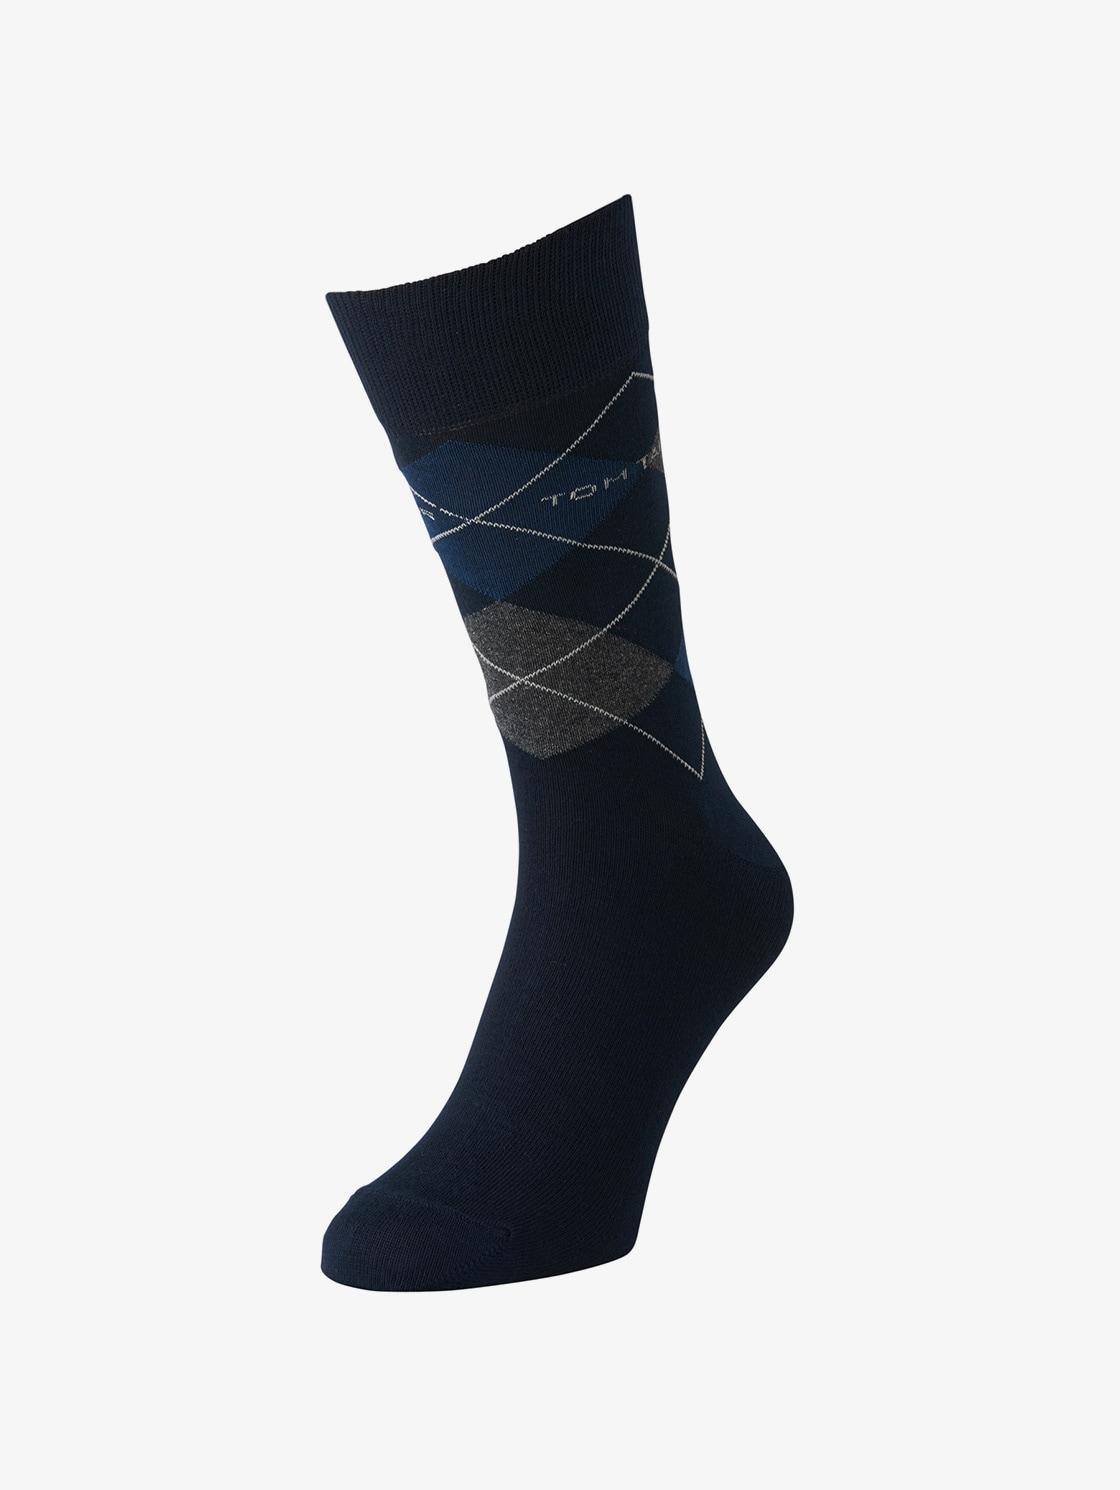 Tom Tailor Casual Socken im Doppel Pack, Herren, dark navy, Größe: 39 42